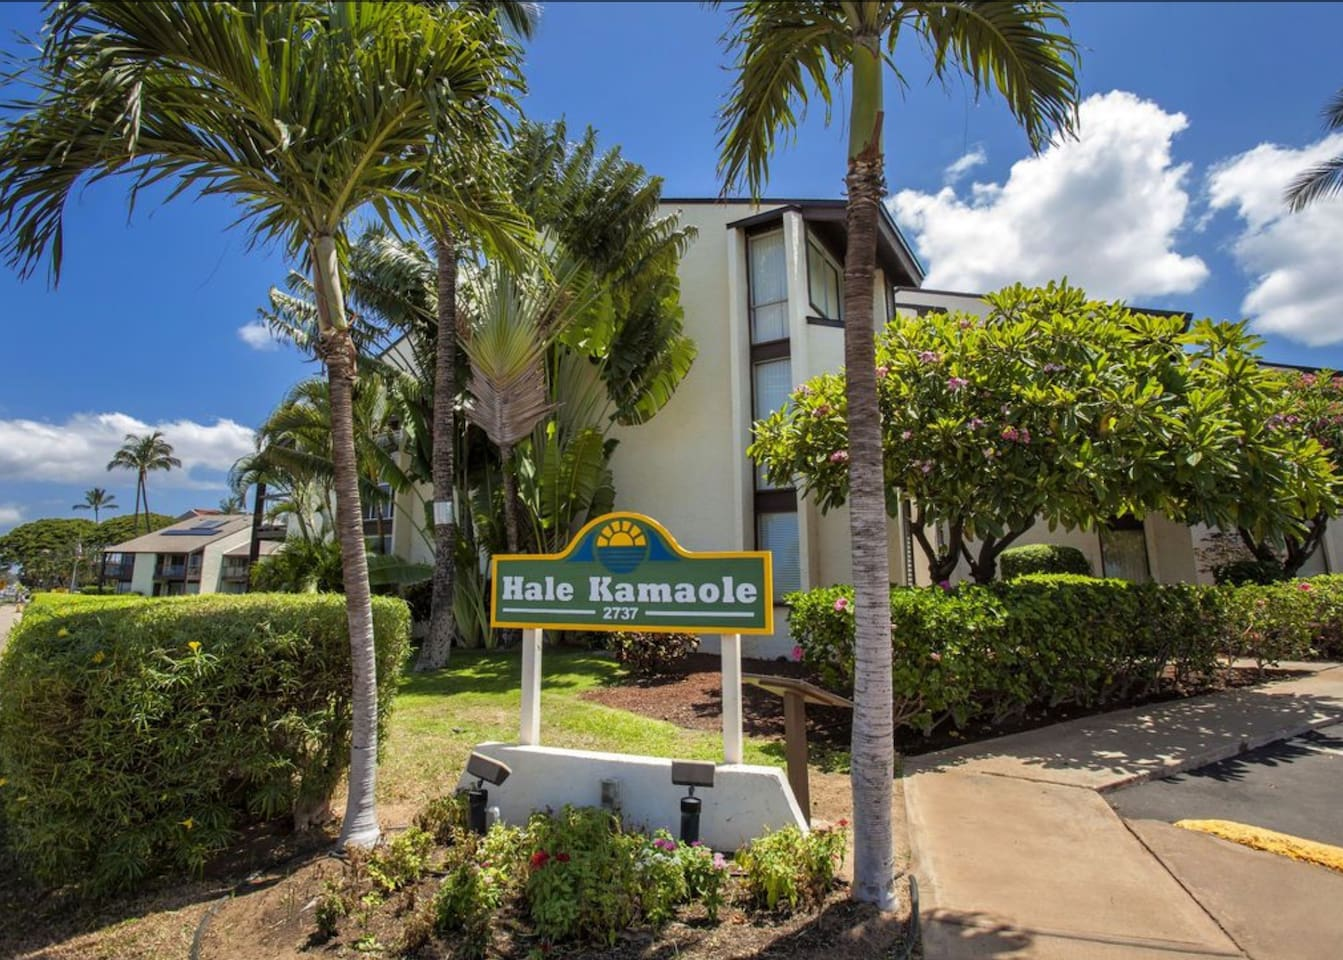 Hawaiian-style 1 BR Condo - steps from the beach!